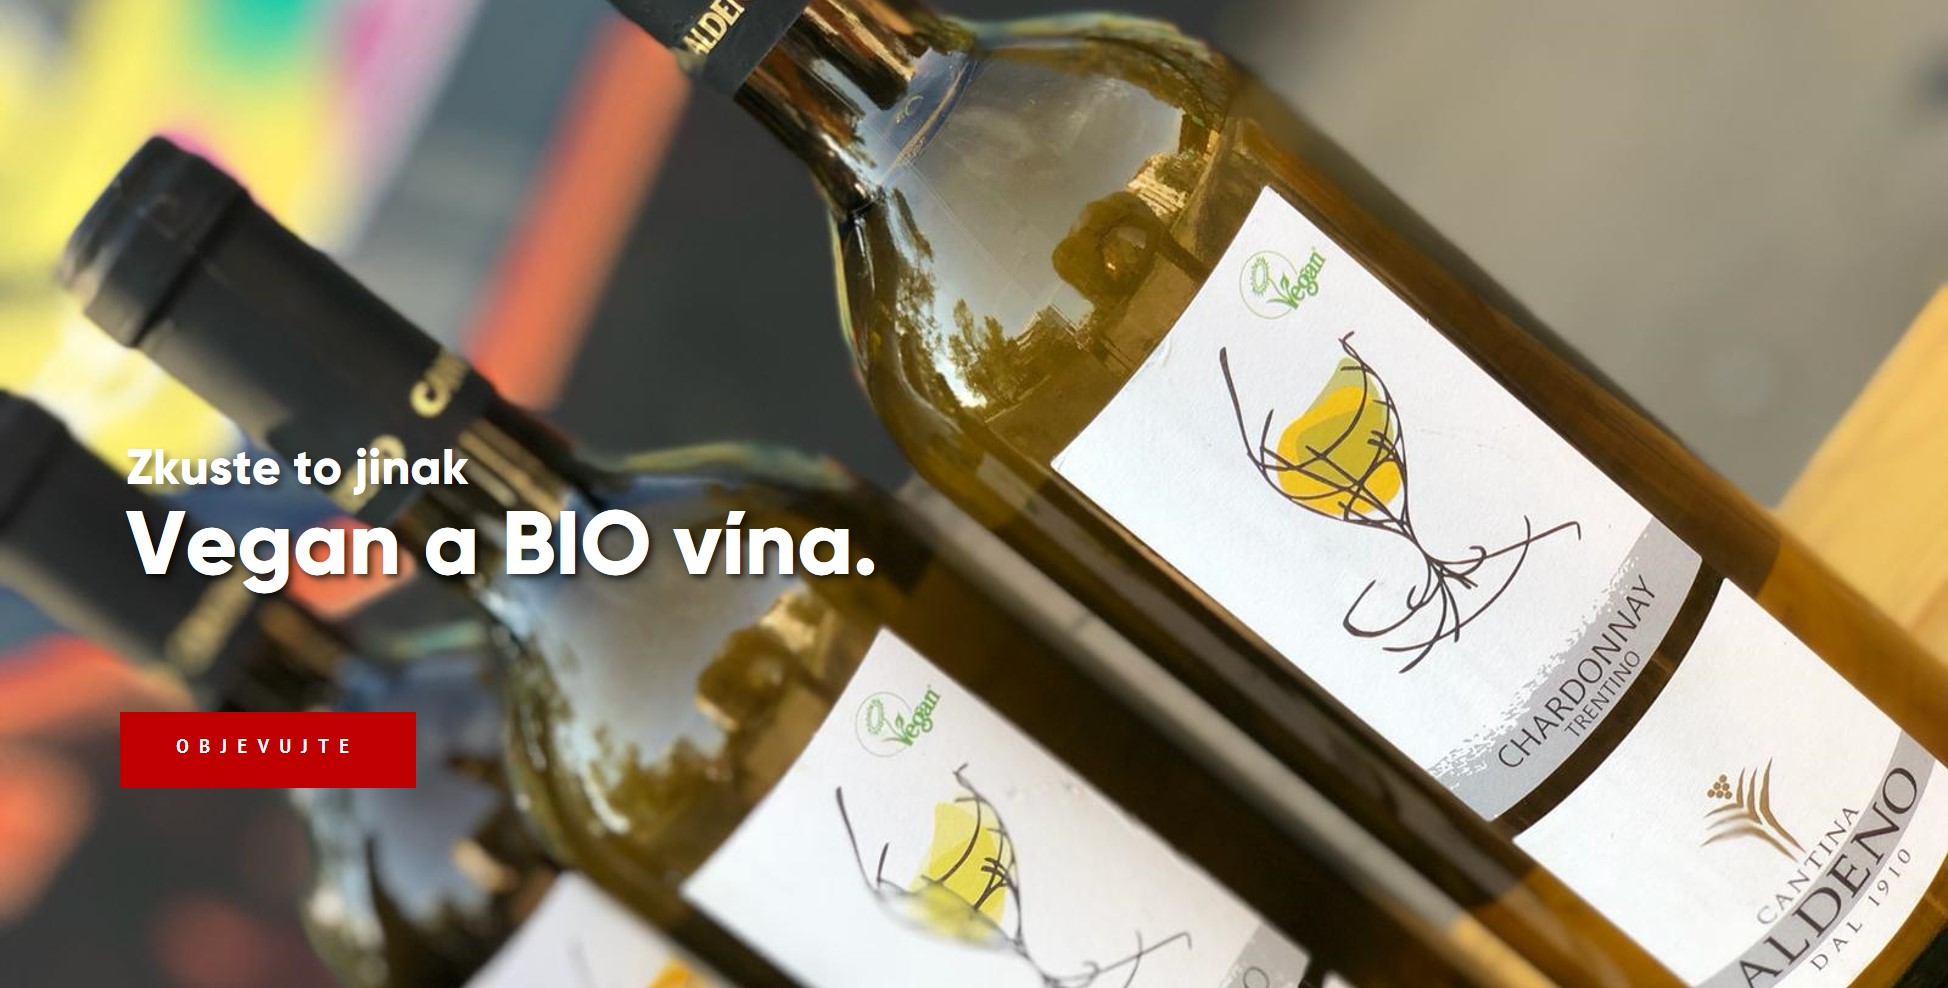 vegan a bio vina